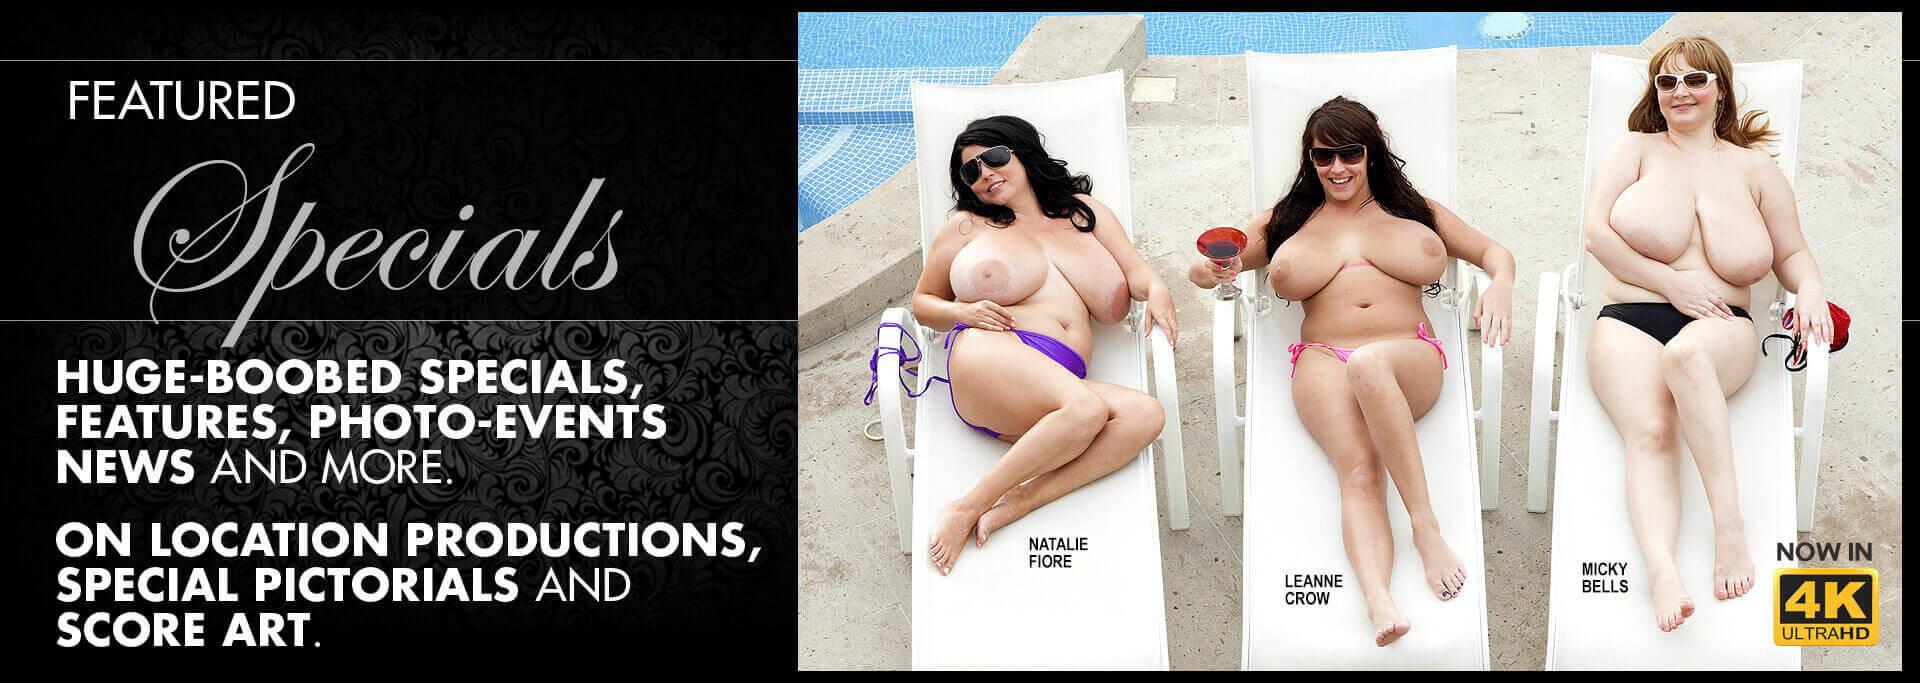 Big boob specials - Join Now!